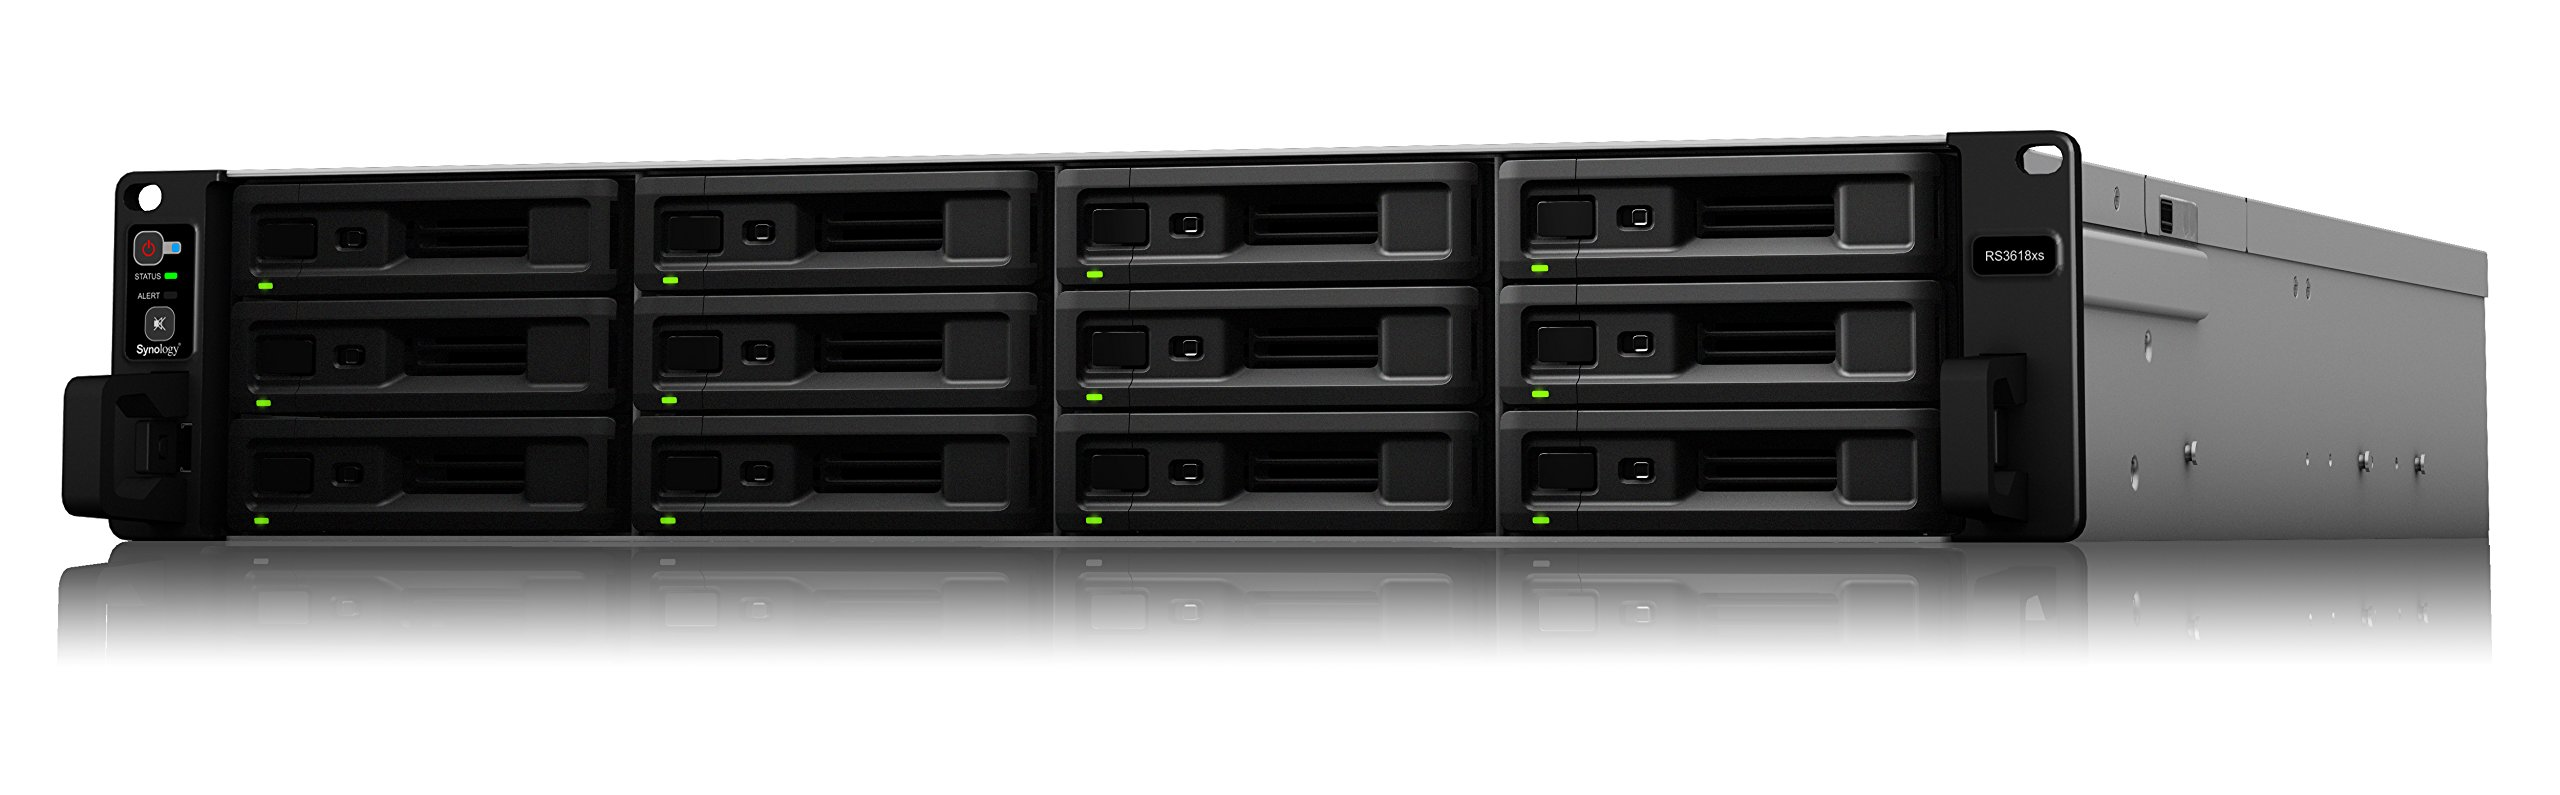 Synology 12bay NAS RackStation RS3618xs (Diskless), RS3618xs